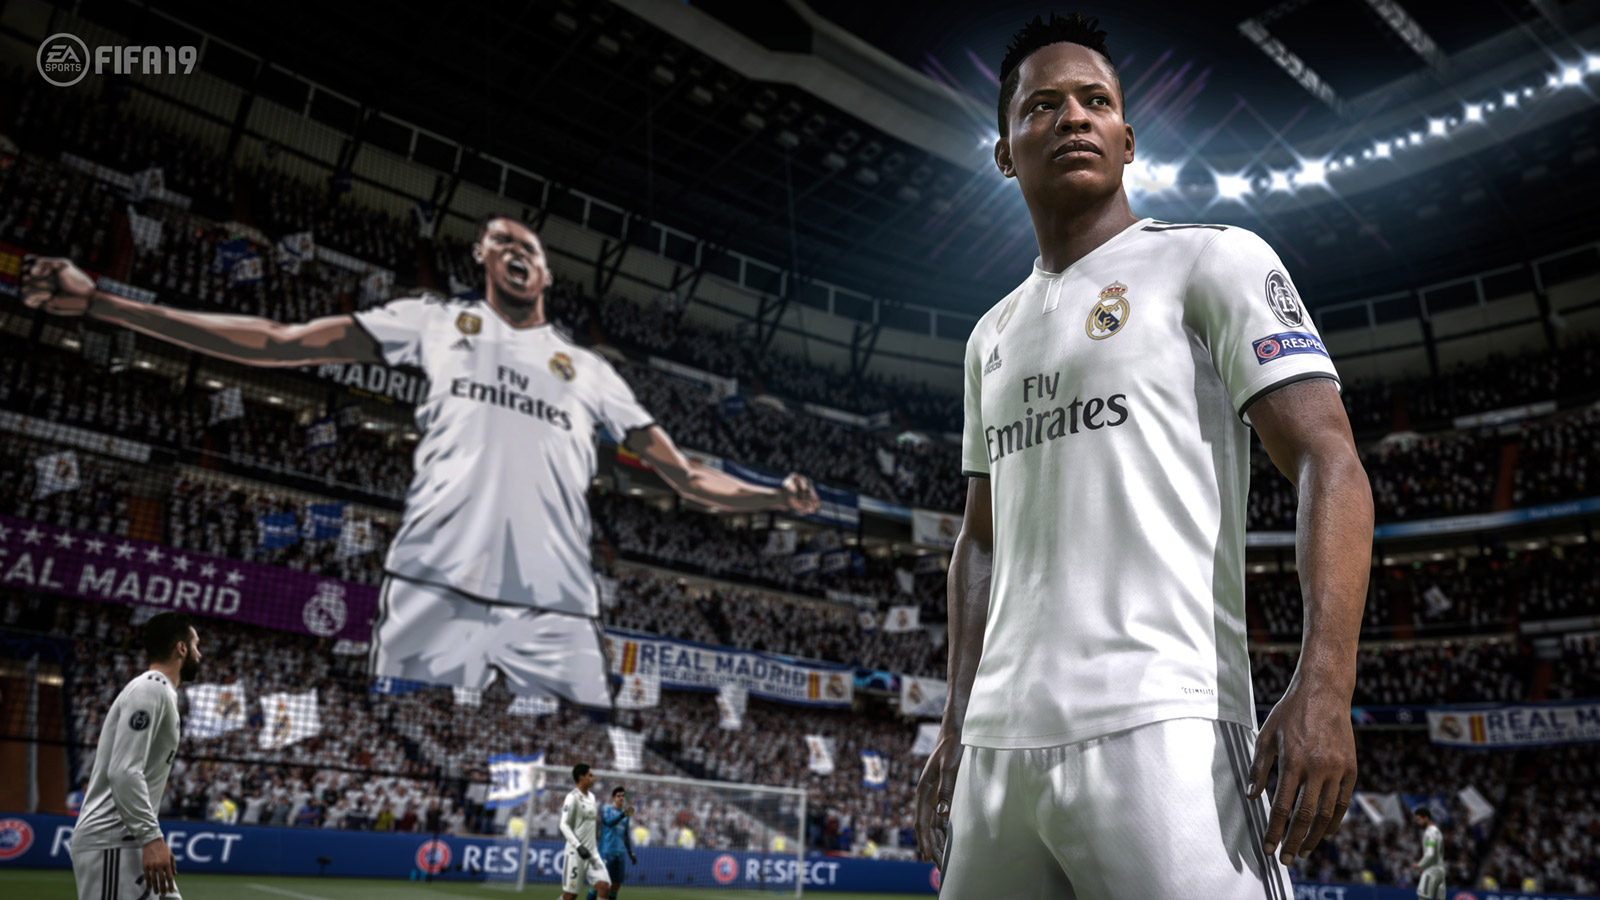 FIFA 19 Wallpaper in 1600x900